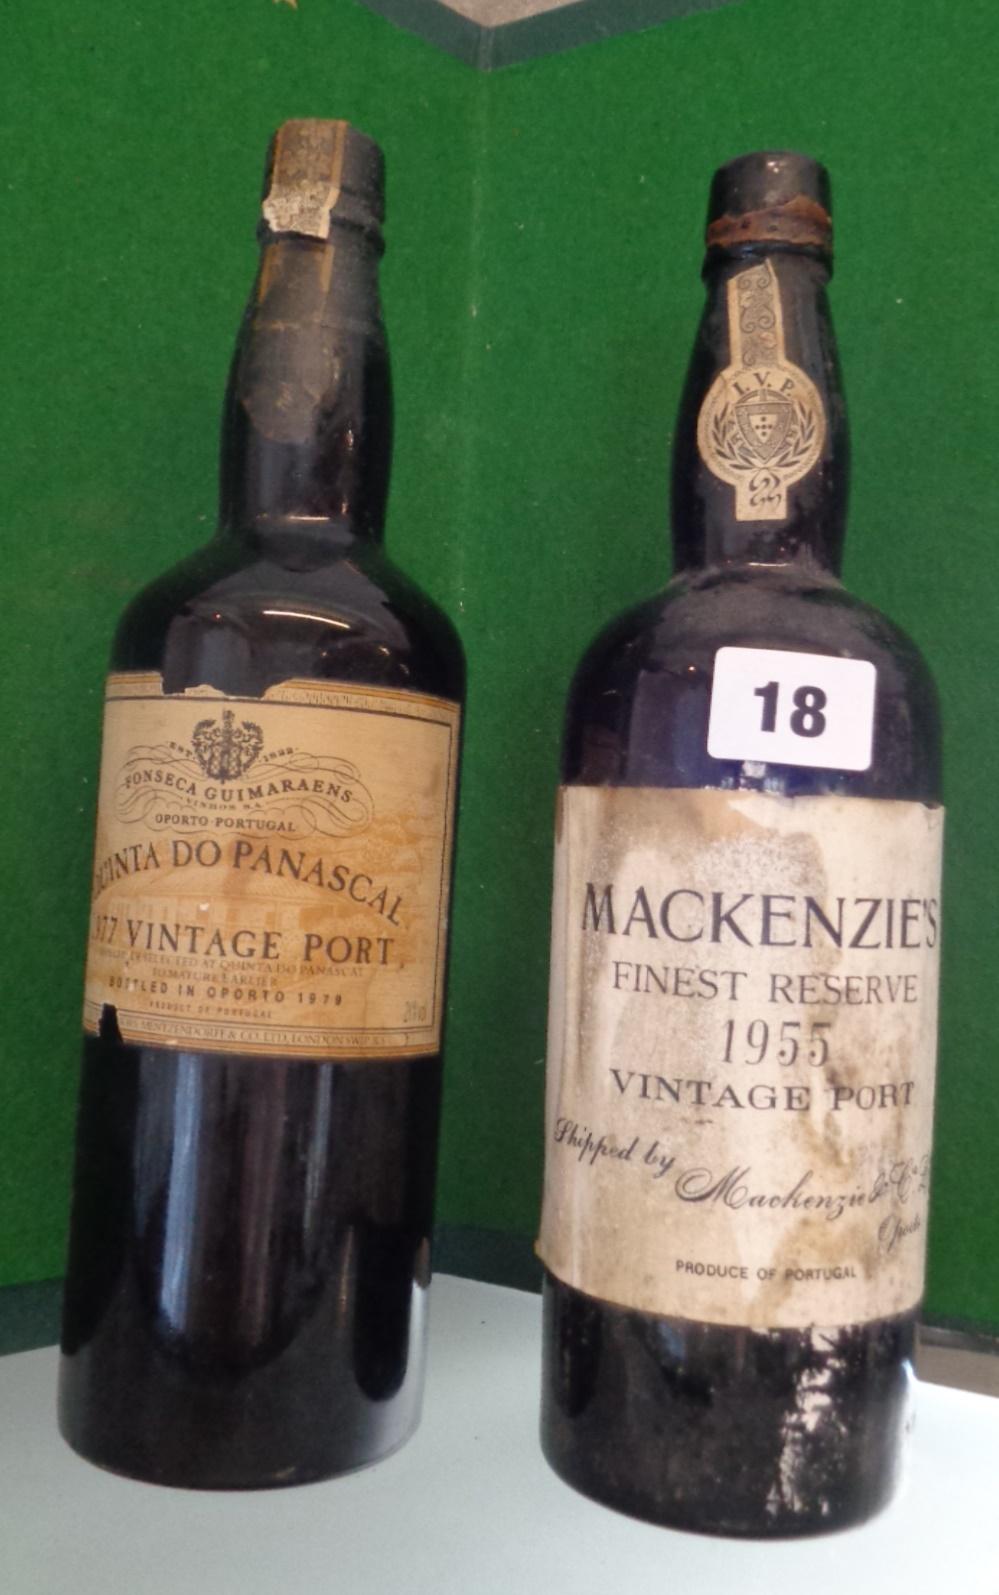 Lot 18 - Vintage Port - Quinta Do Panascal 1977 and Mackenzie's Finest Reserve 1955